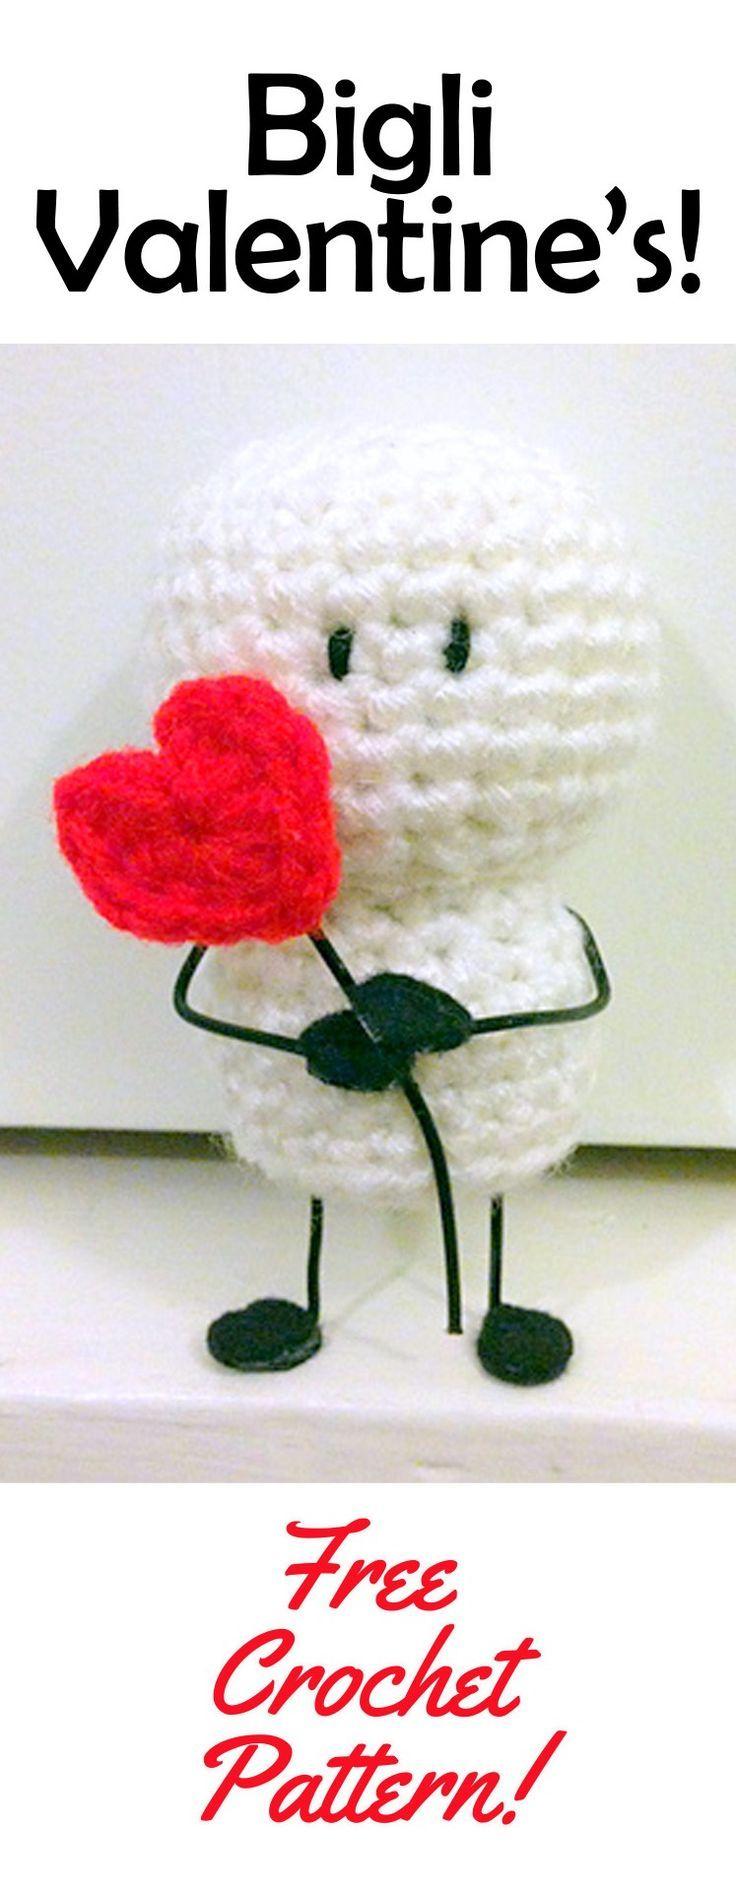 193 best amigurumi images on Pinterest | Amigurumi patterns ...